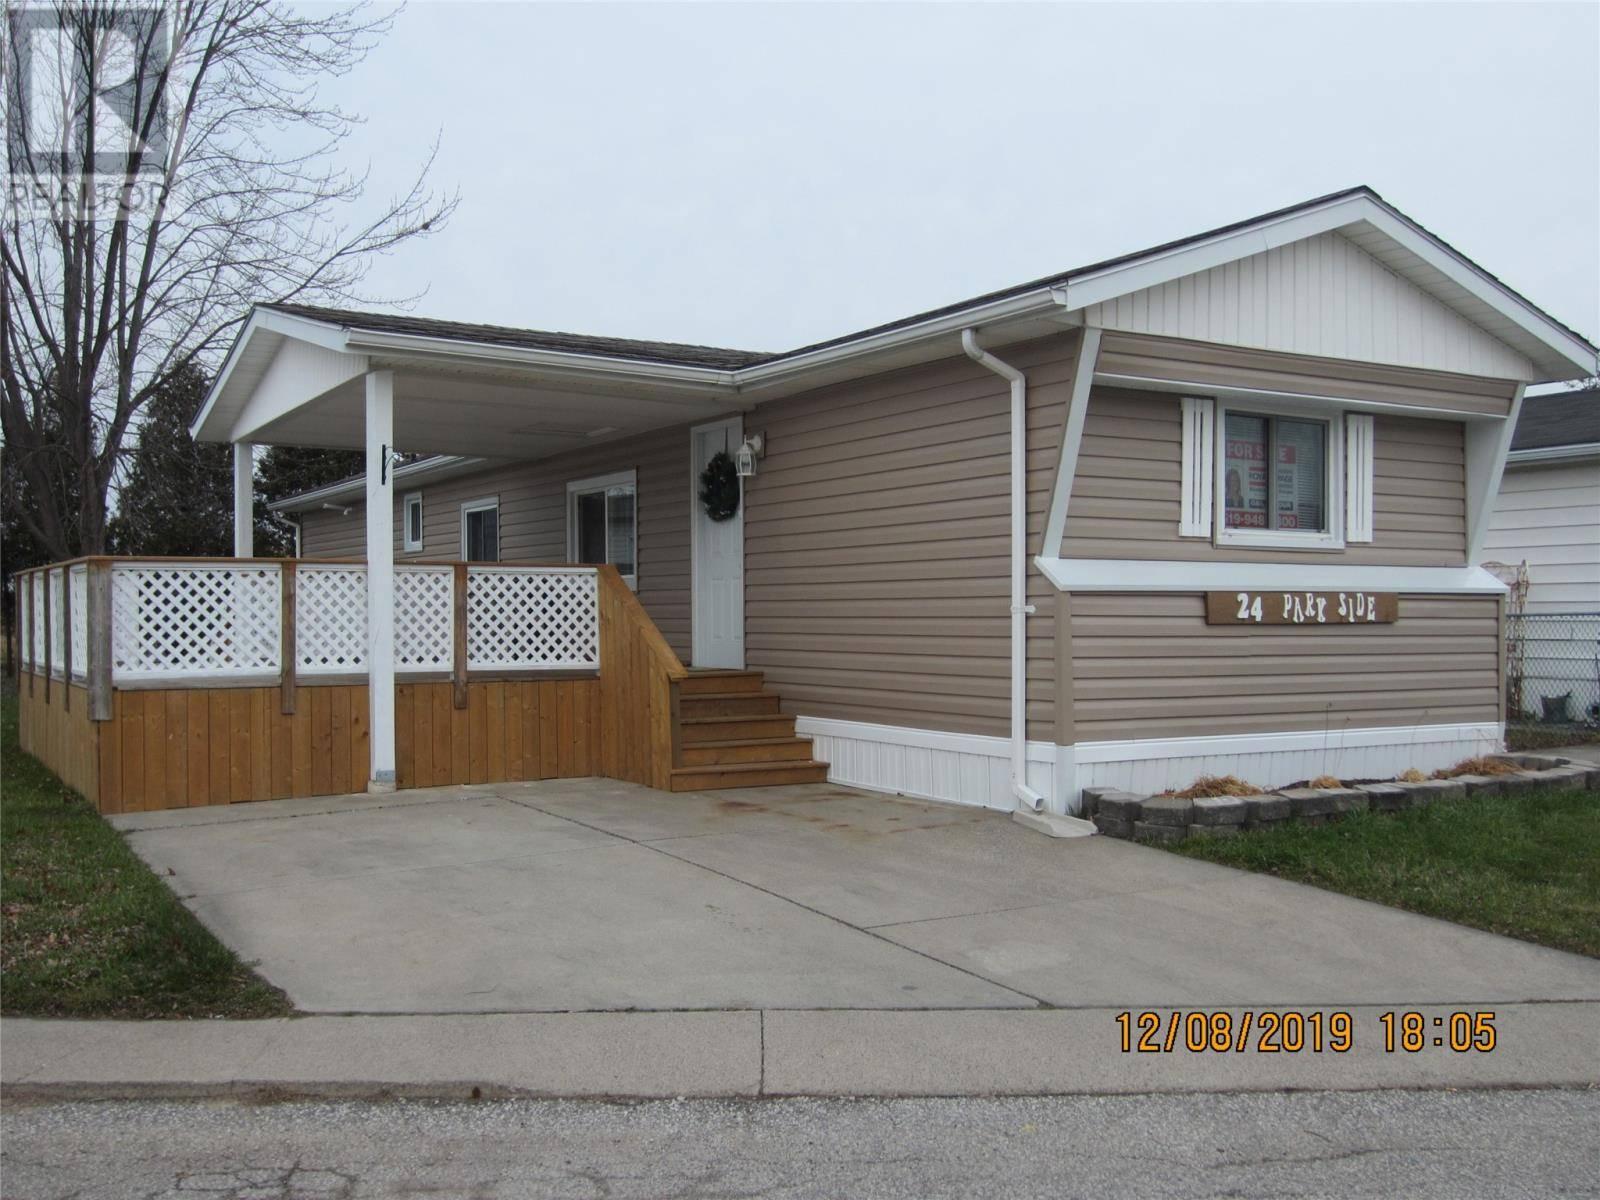 House for sale at 24 Parkside  Mcgregor Ontario - MLS: 19029210